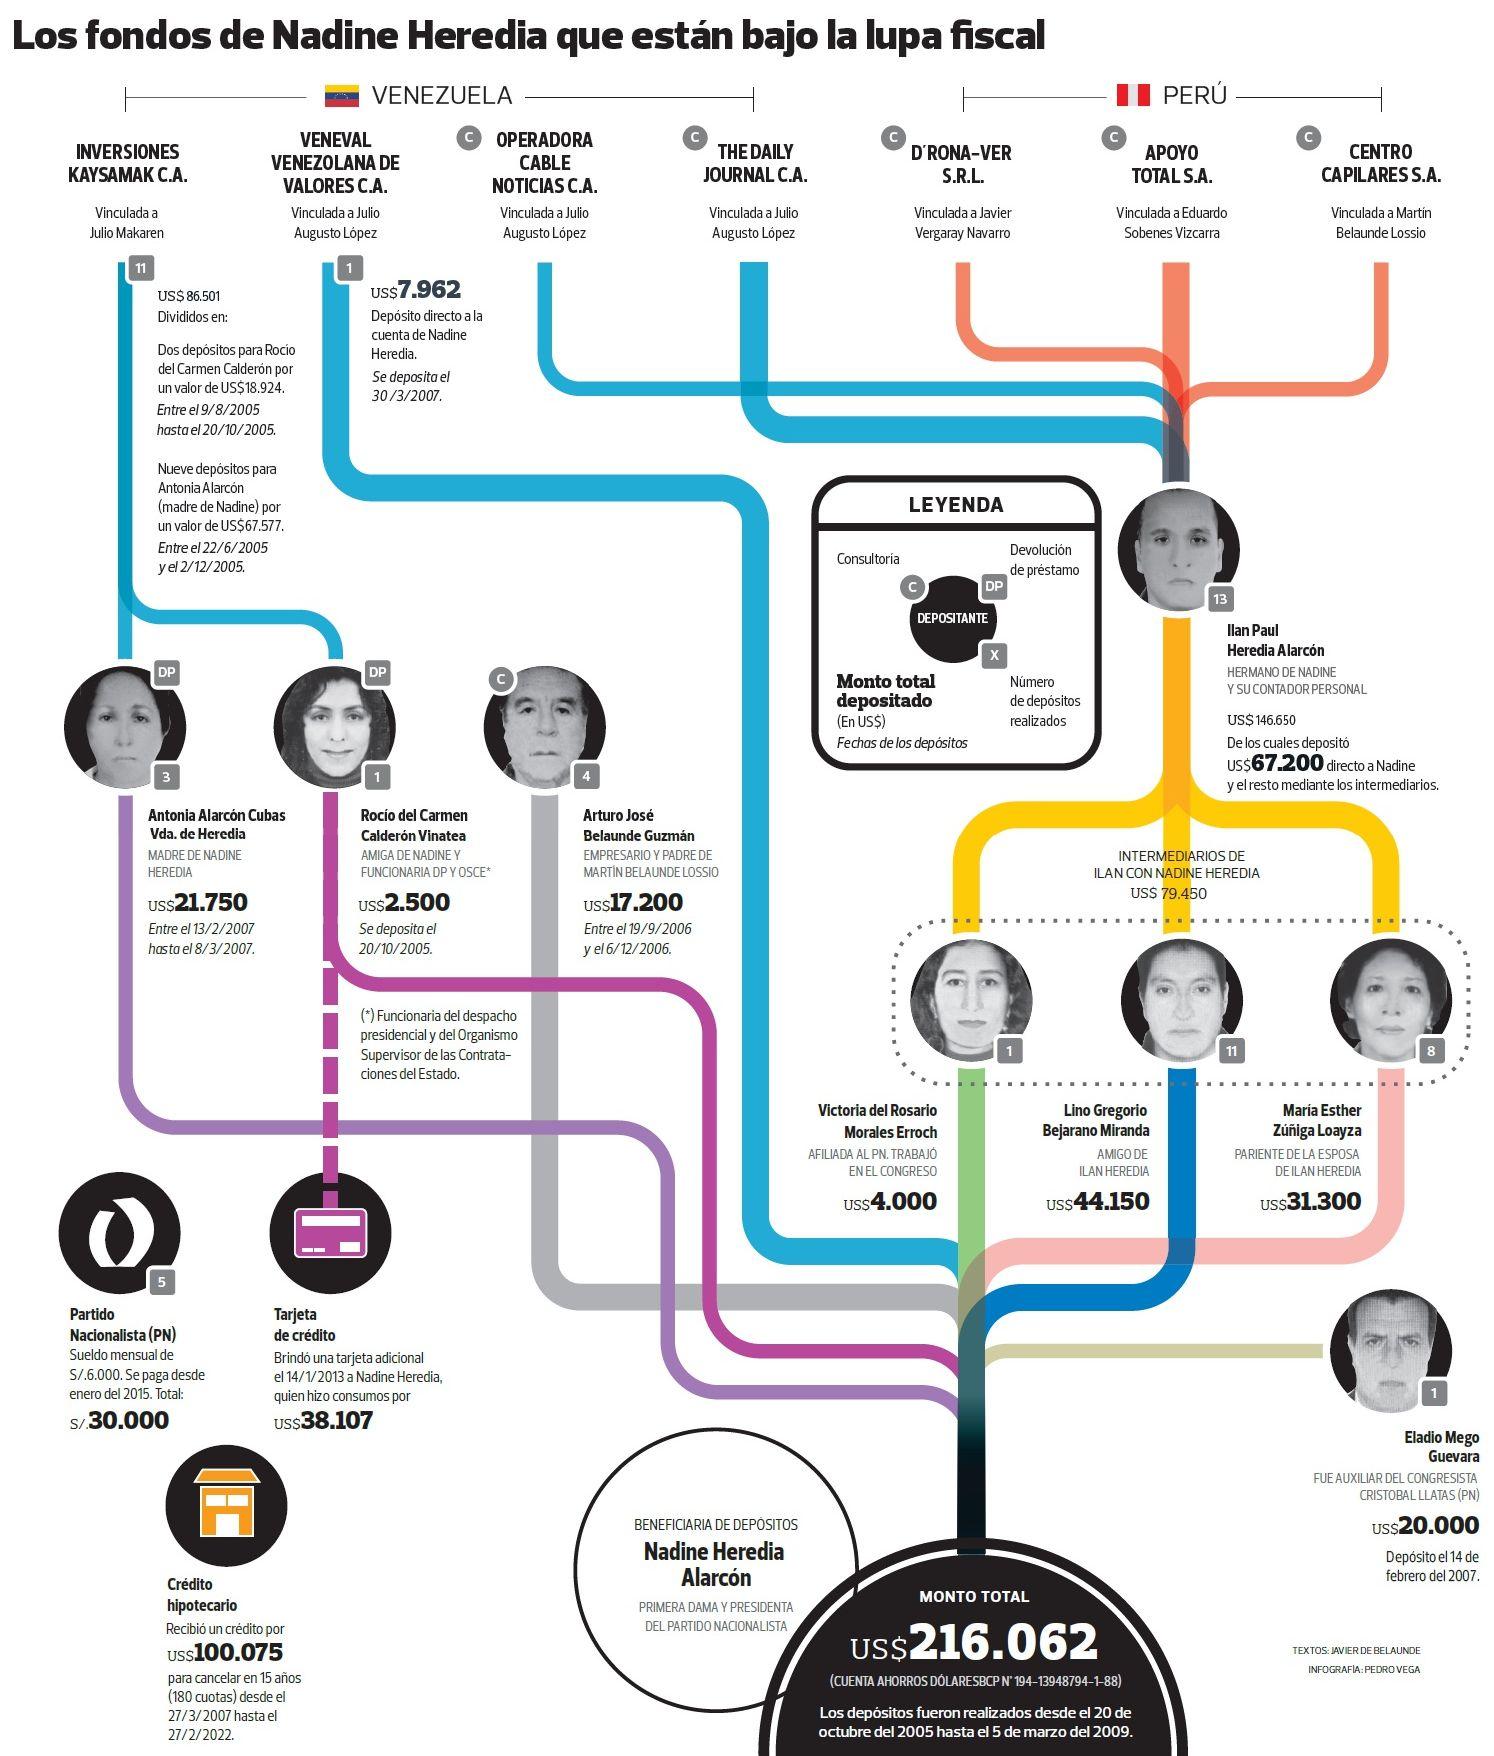 Nadine Heredia's Money Laundering Web